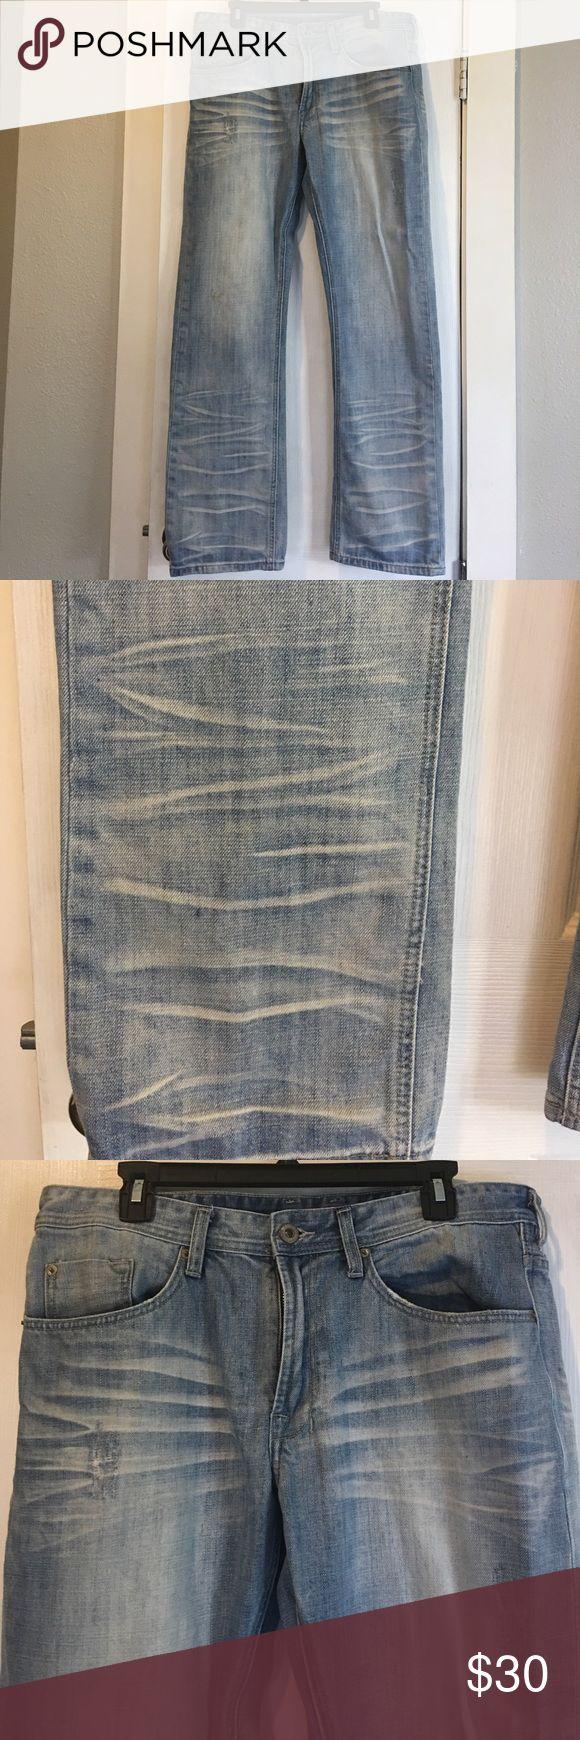 Men's Buffalo Jeans Style: Driven Basic Straight 34x32 Buffalo Jeans